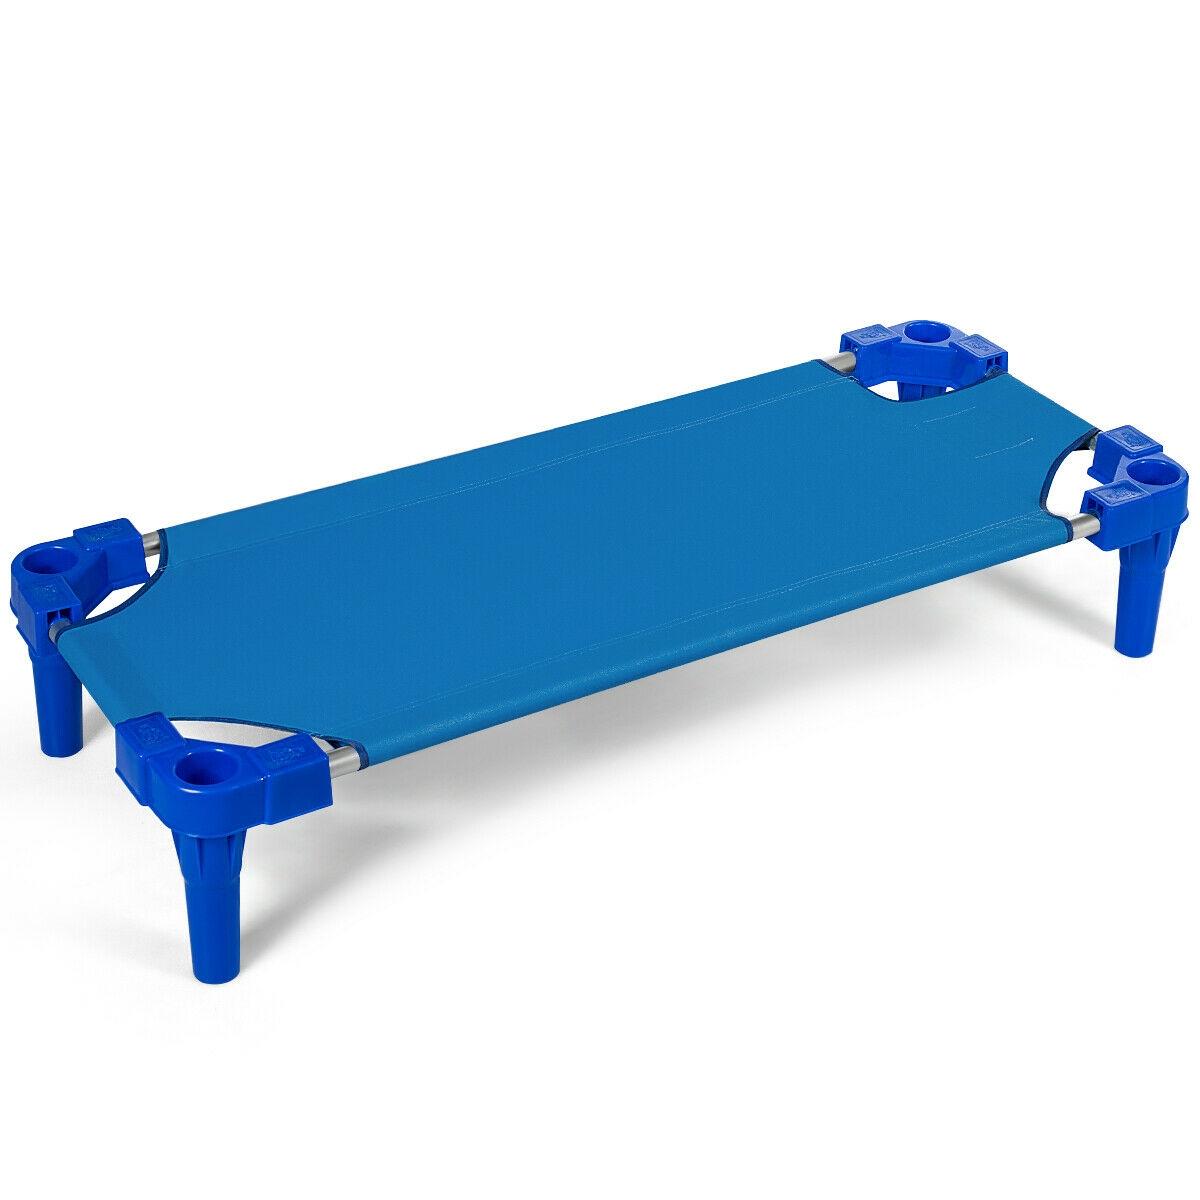 Pack of 6 Stackable Daycare Standard Rest Cots-Blue